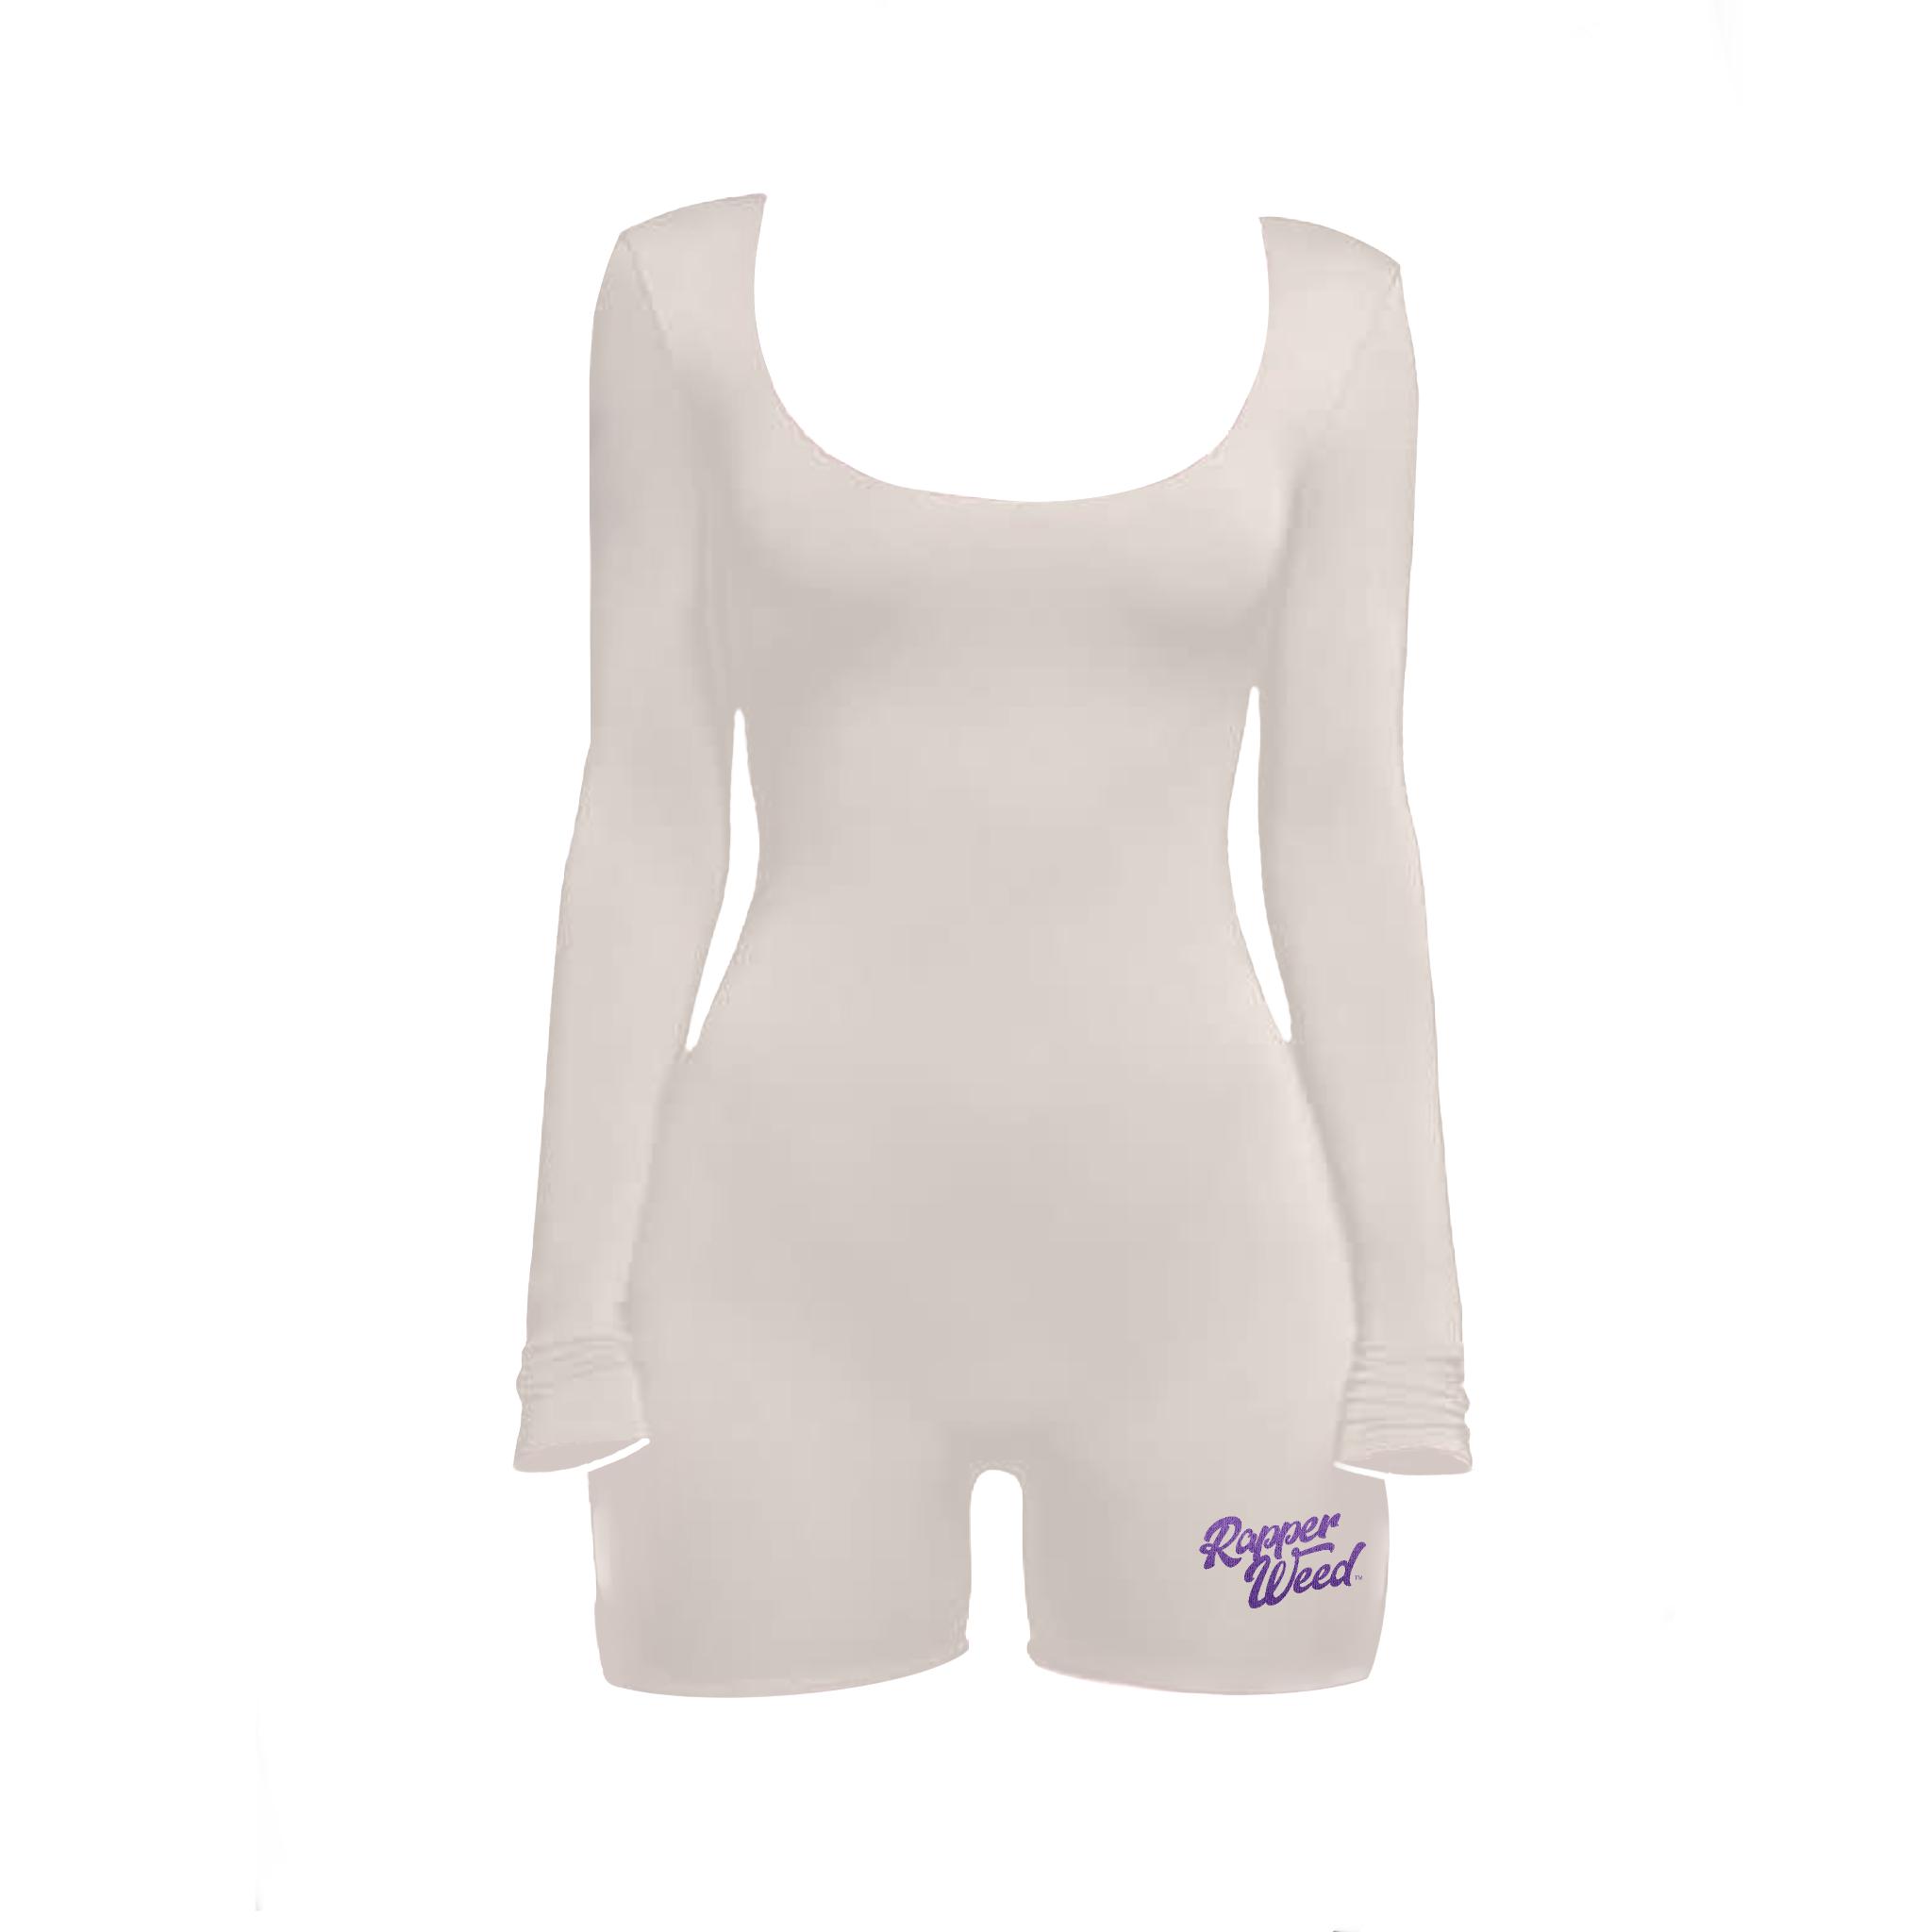 RW Embroidered Long Sleeve Bodysuit